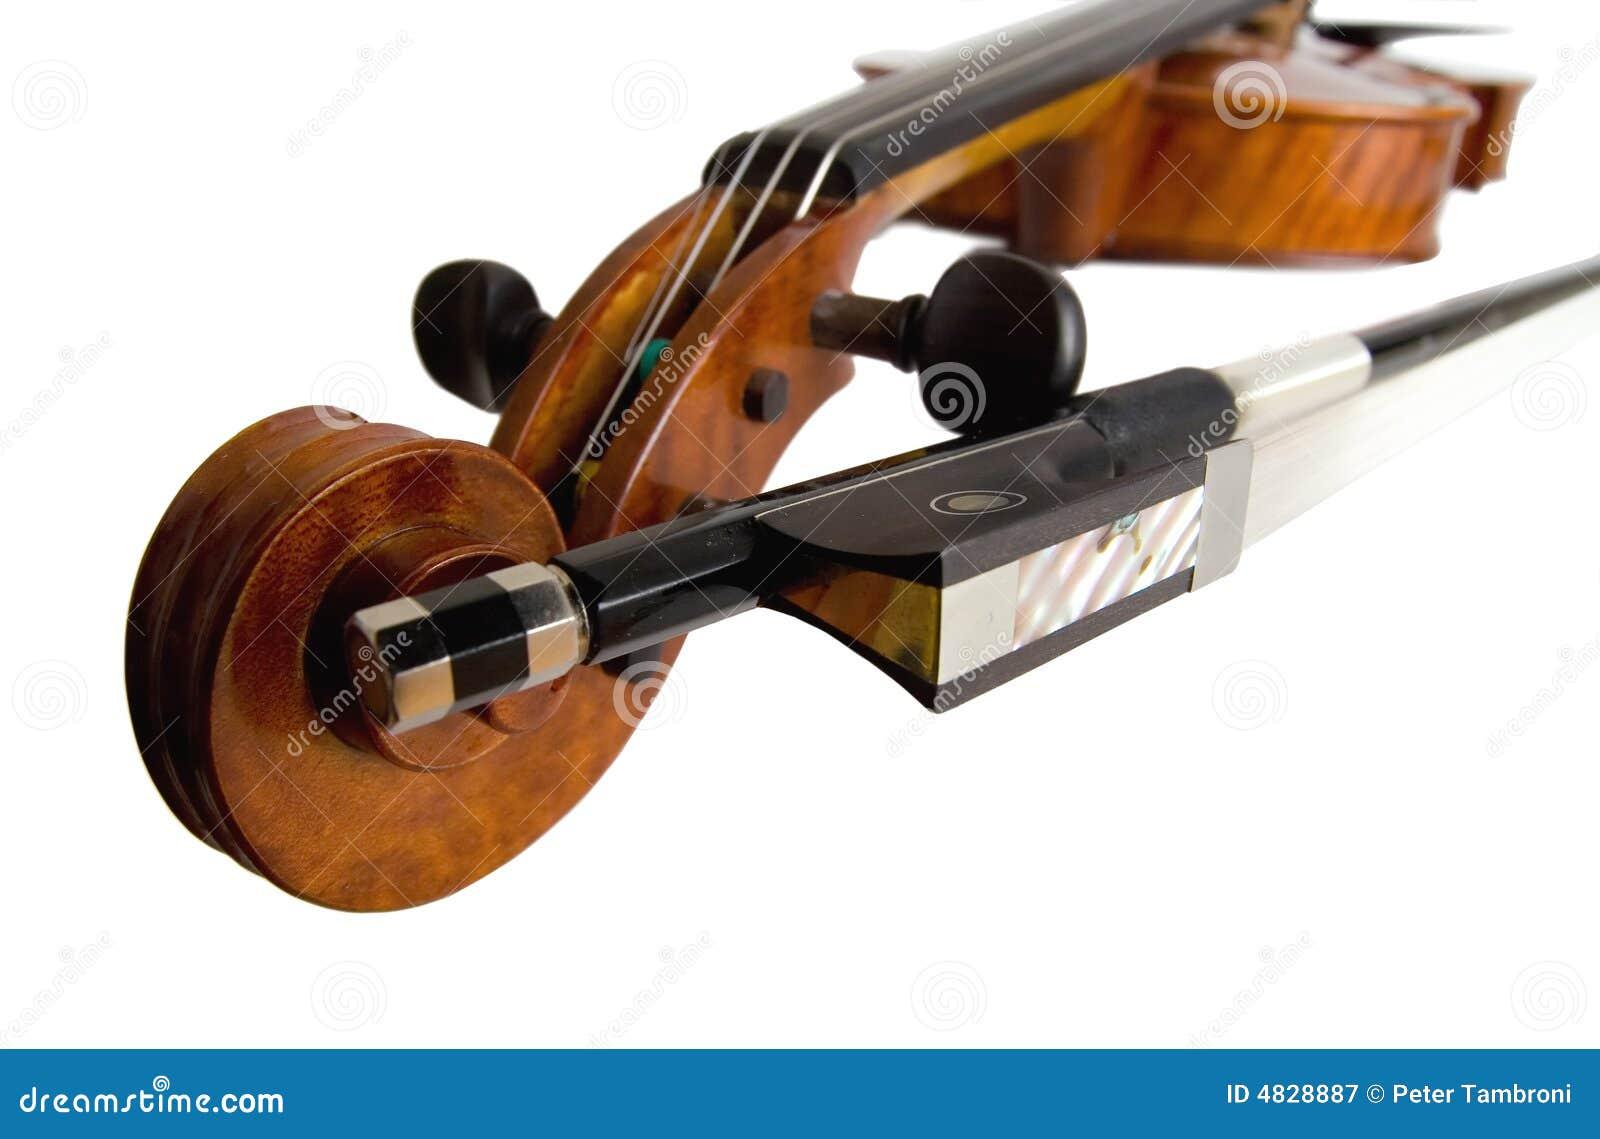 Extreme Violin